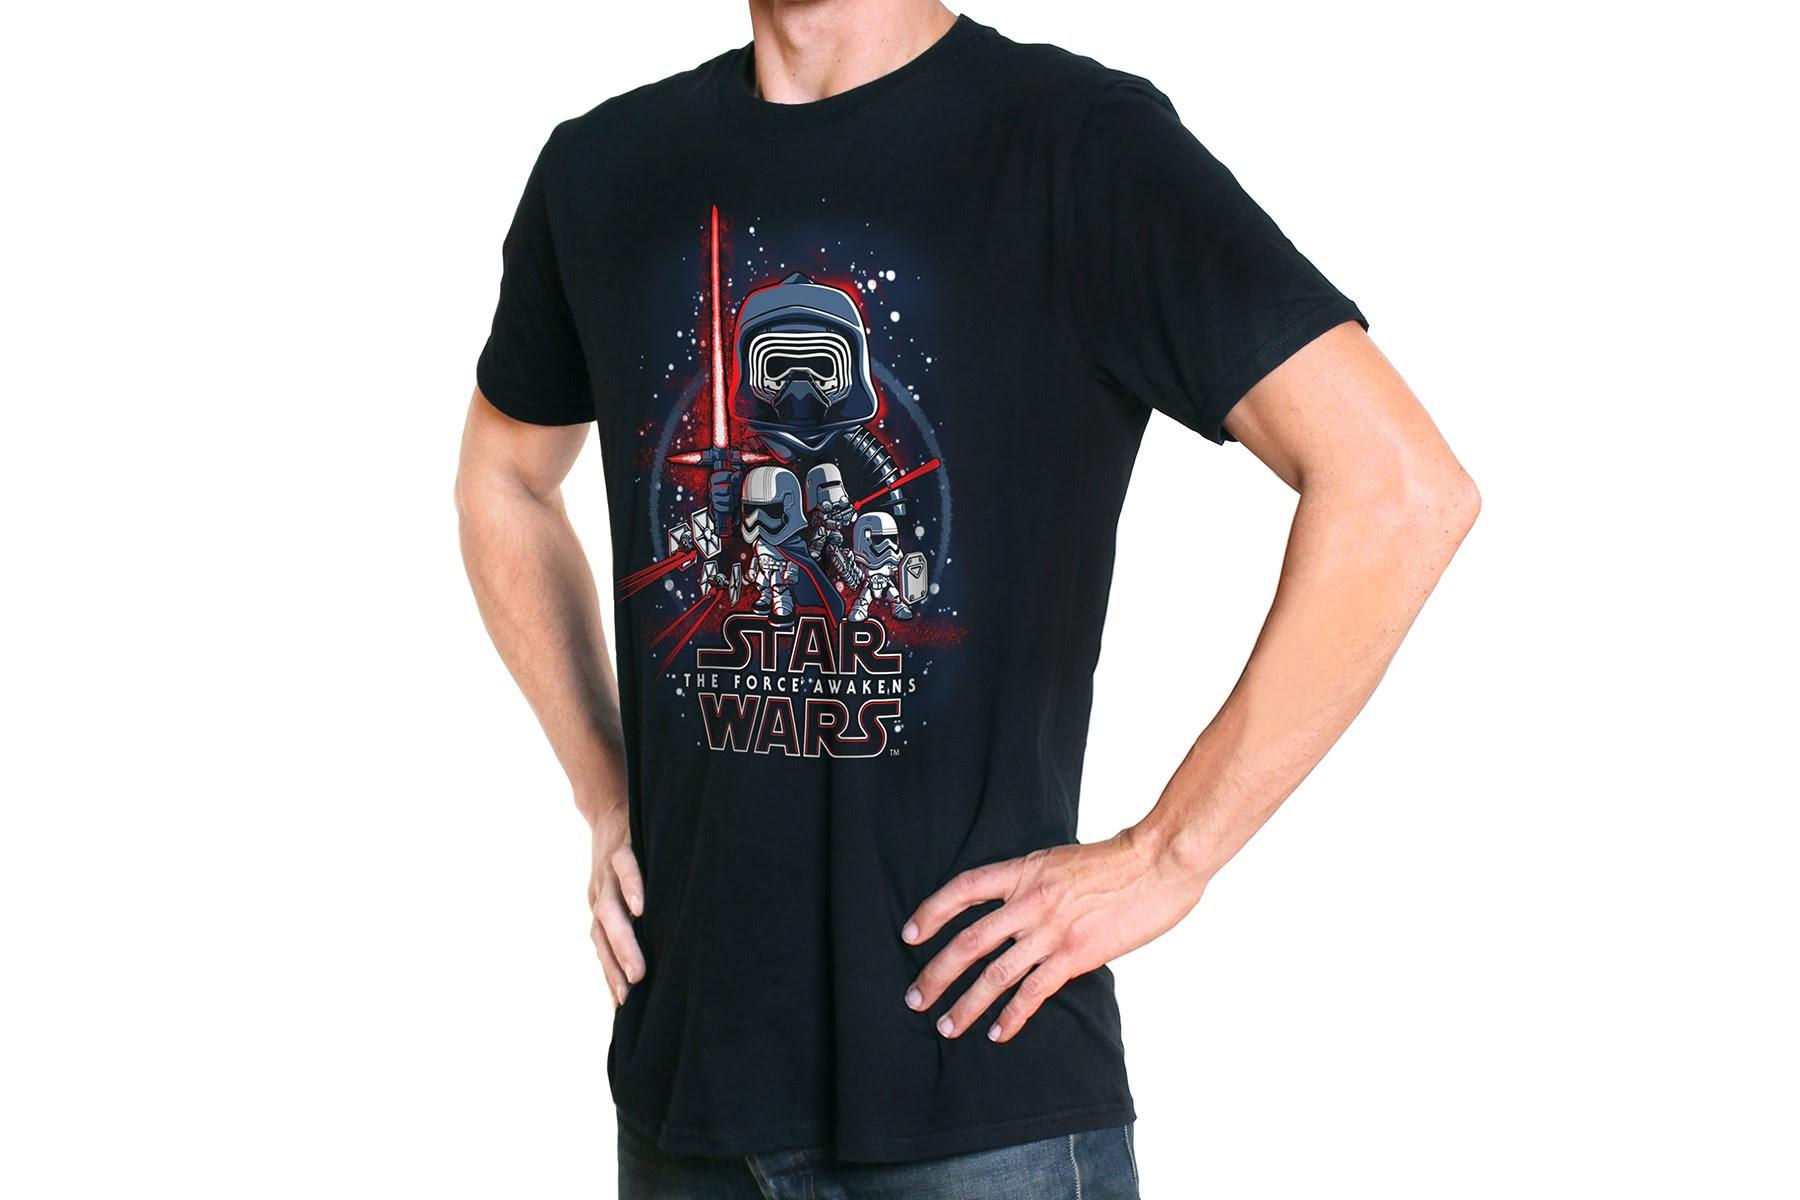 Star Wars The Force Awakens Funko Pop Tees